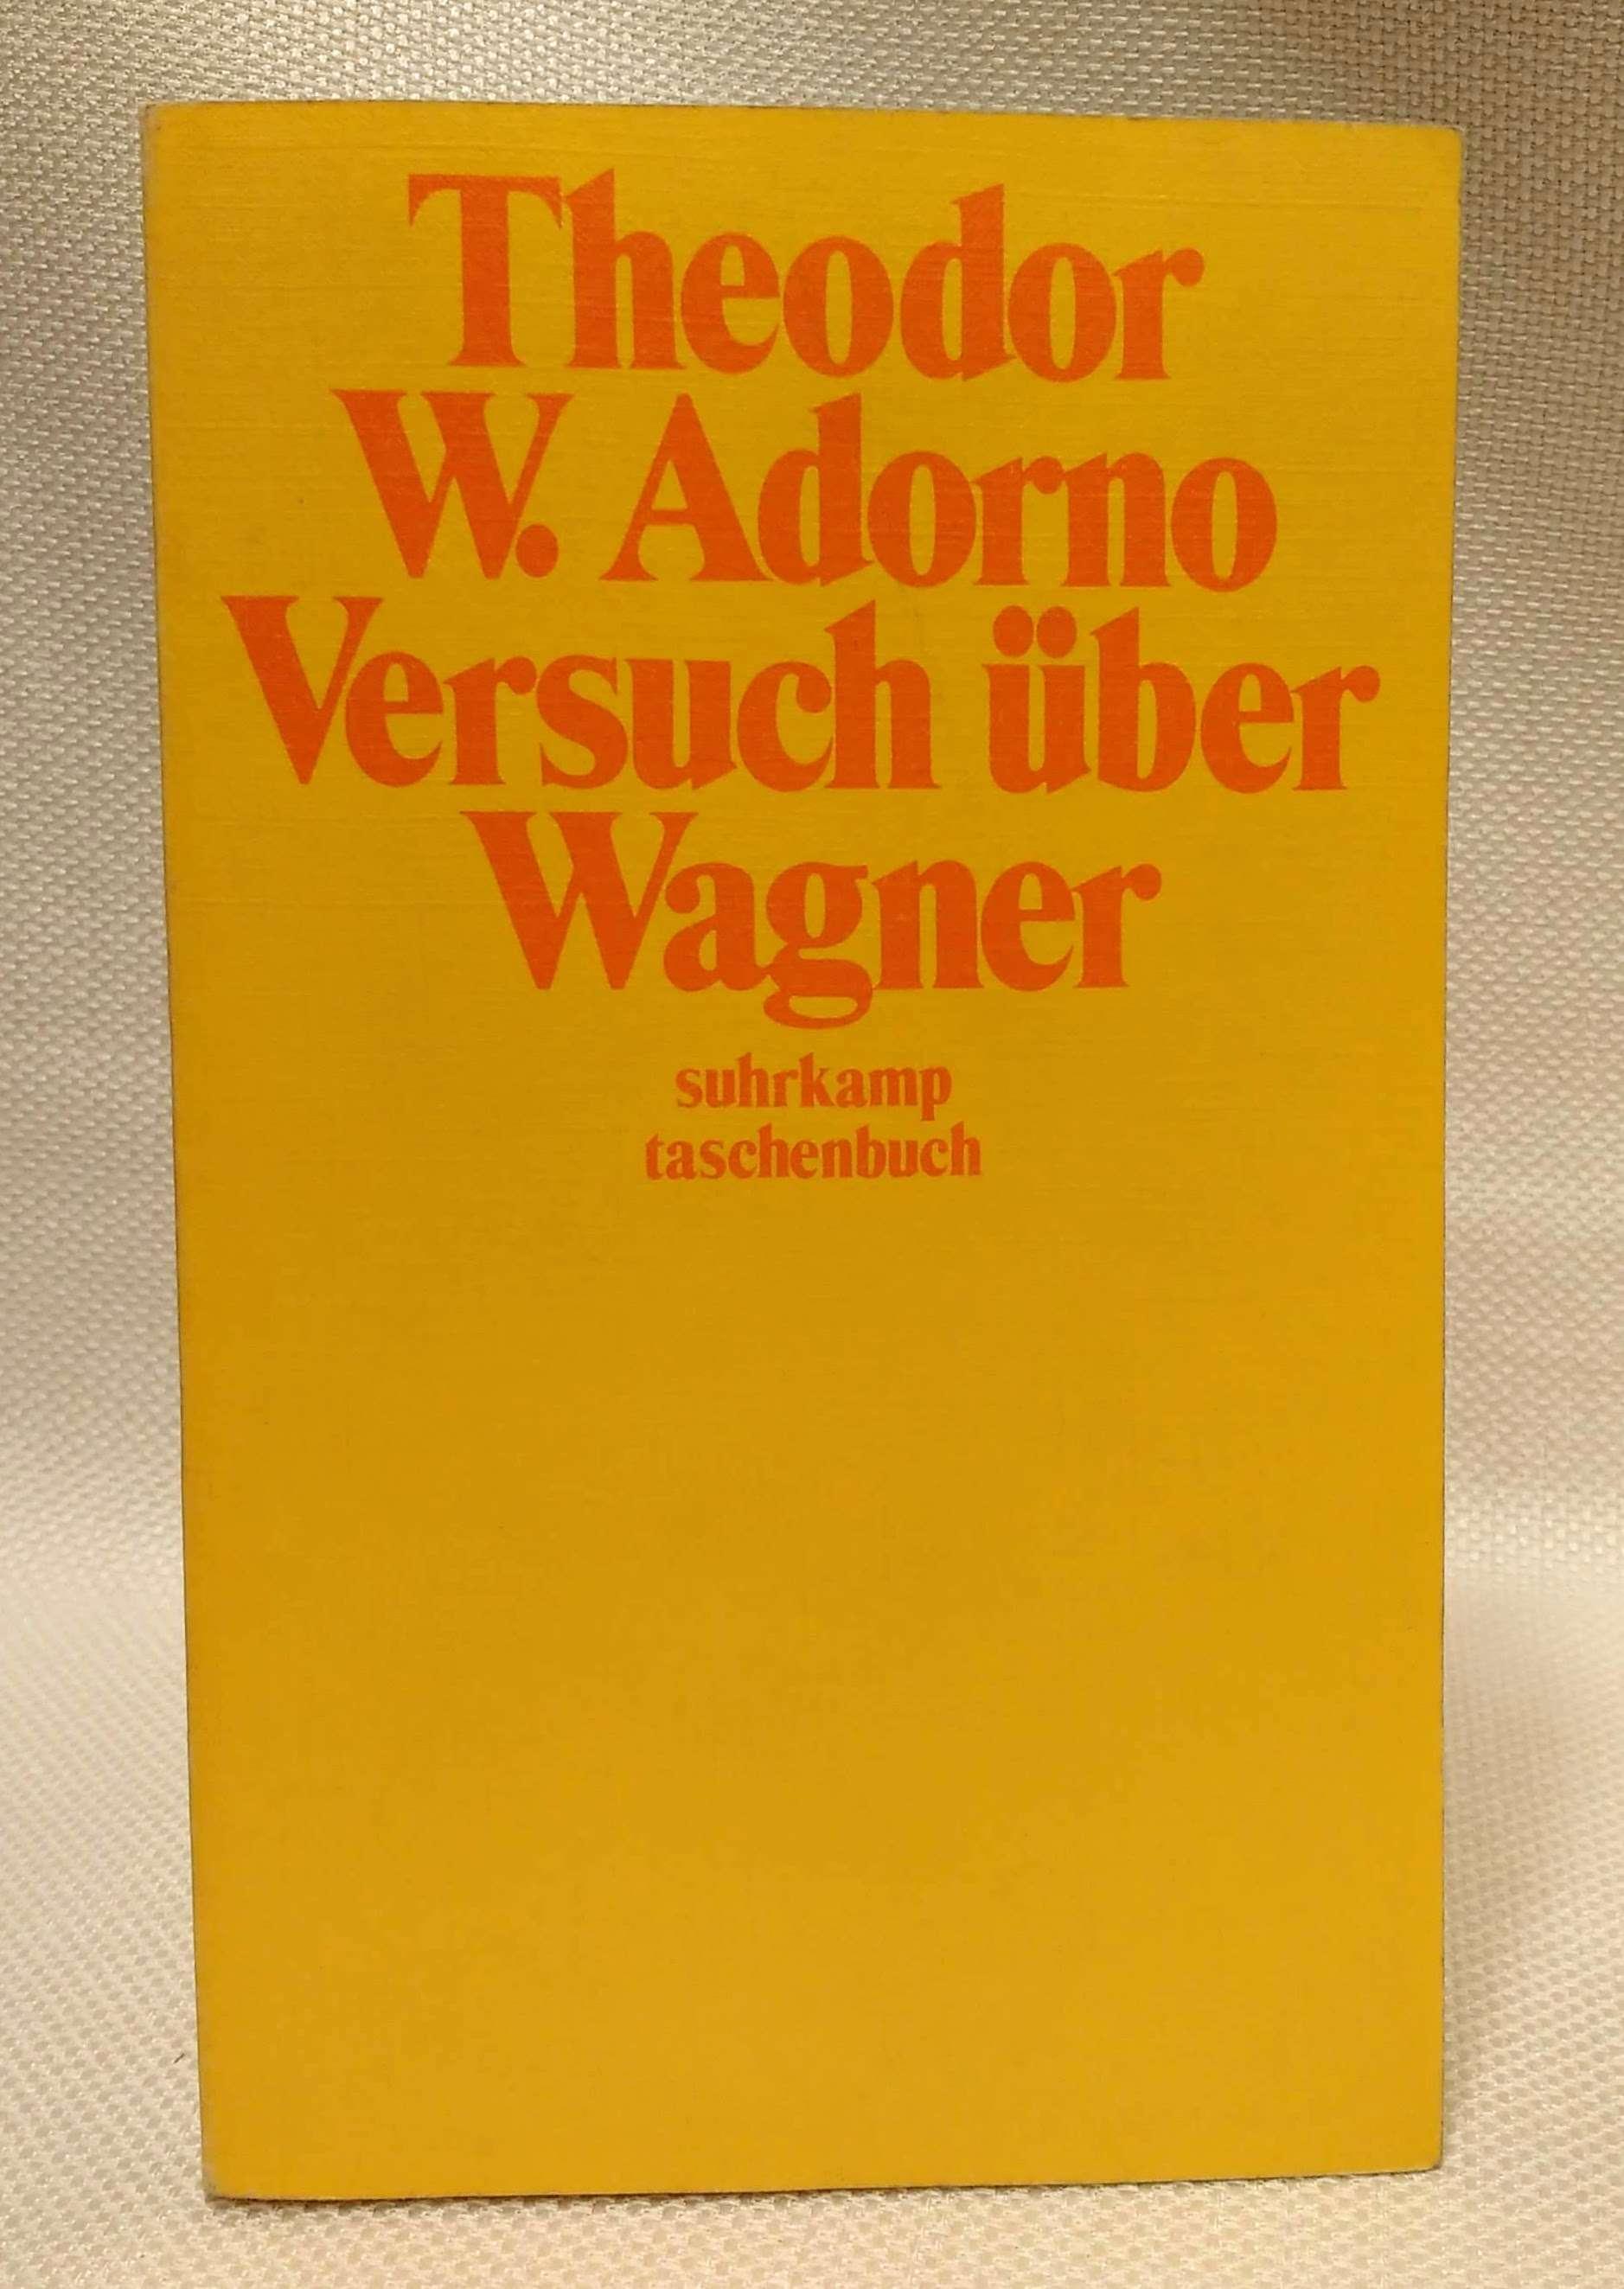 Versuch uber Wagner, Adorno, Theodor W.